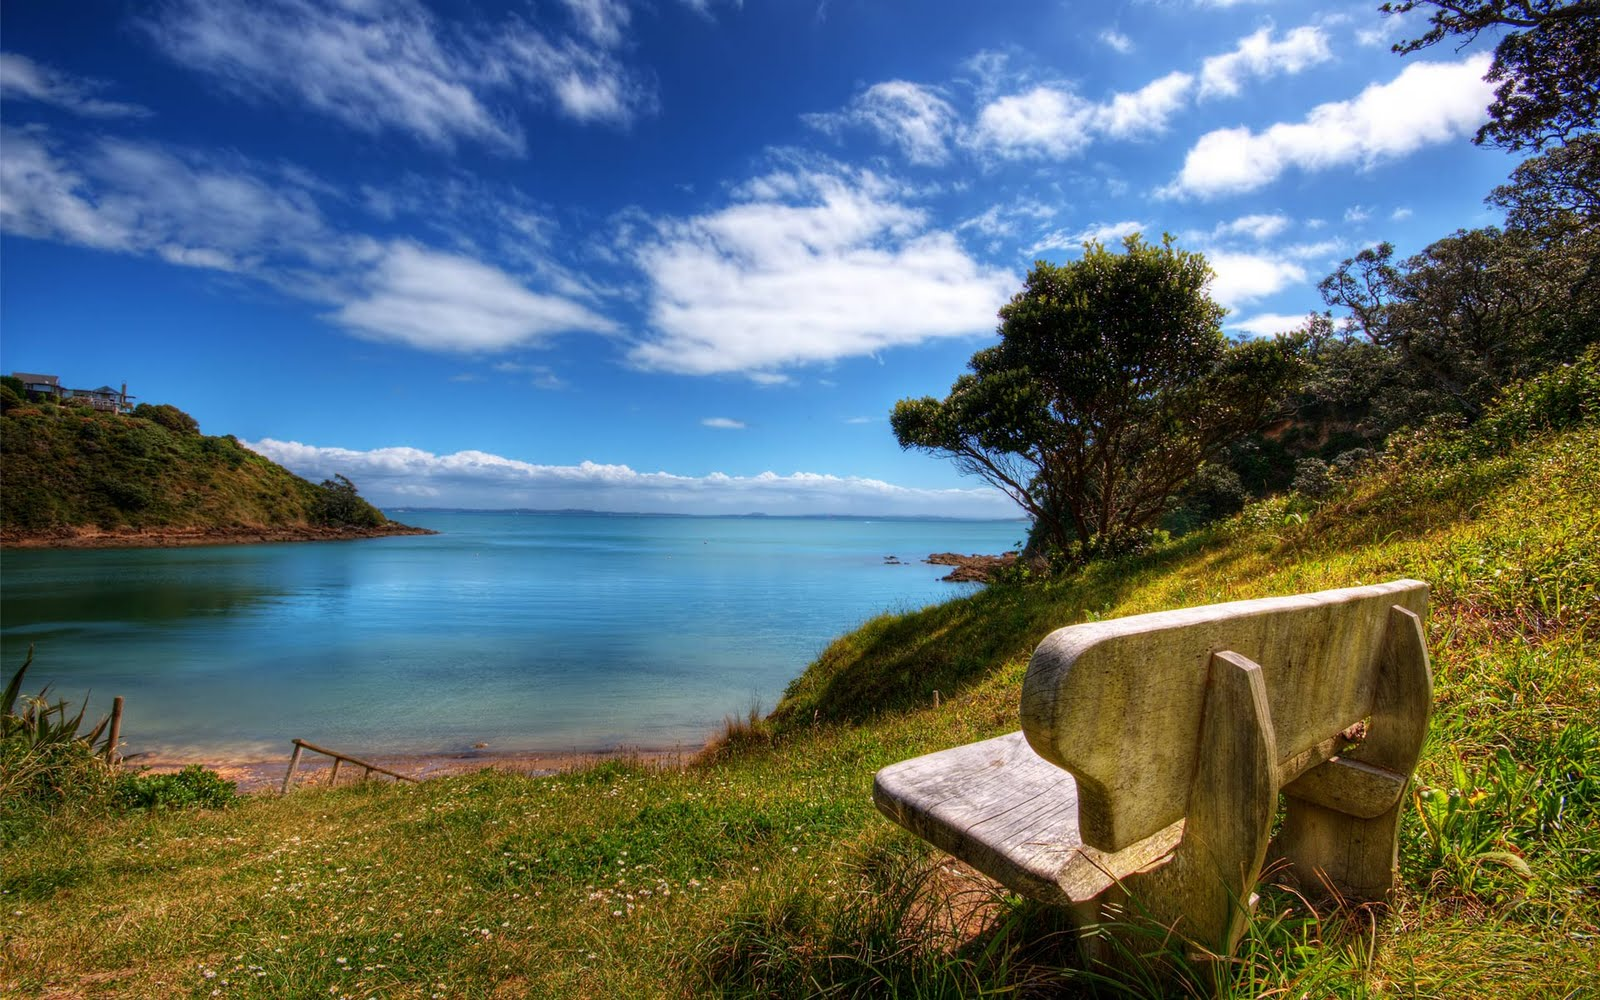 Beach Lake   Olympic National Park2C Washington - Beauty O'v NaTuRe ....... !!!!!!!!